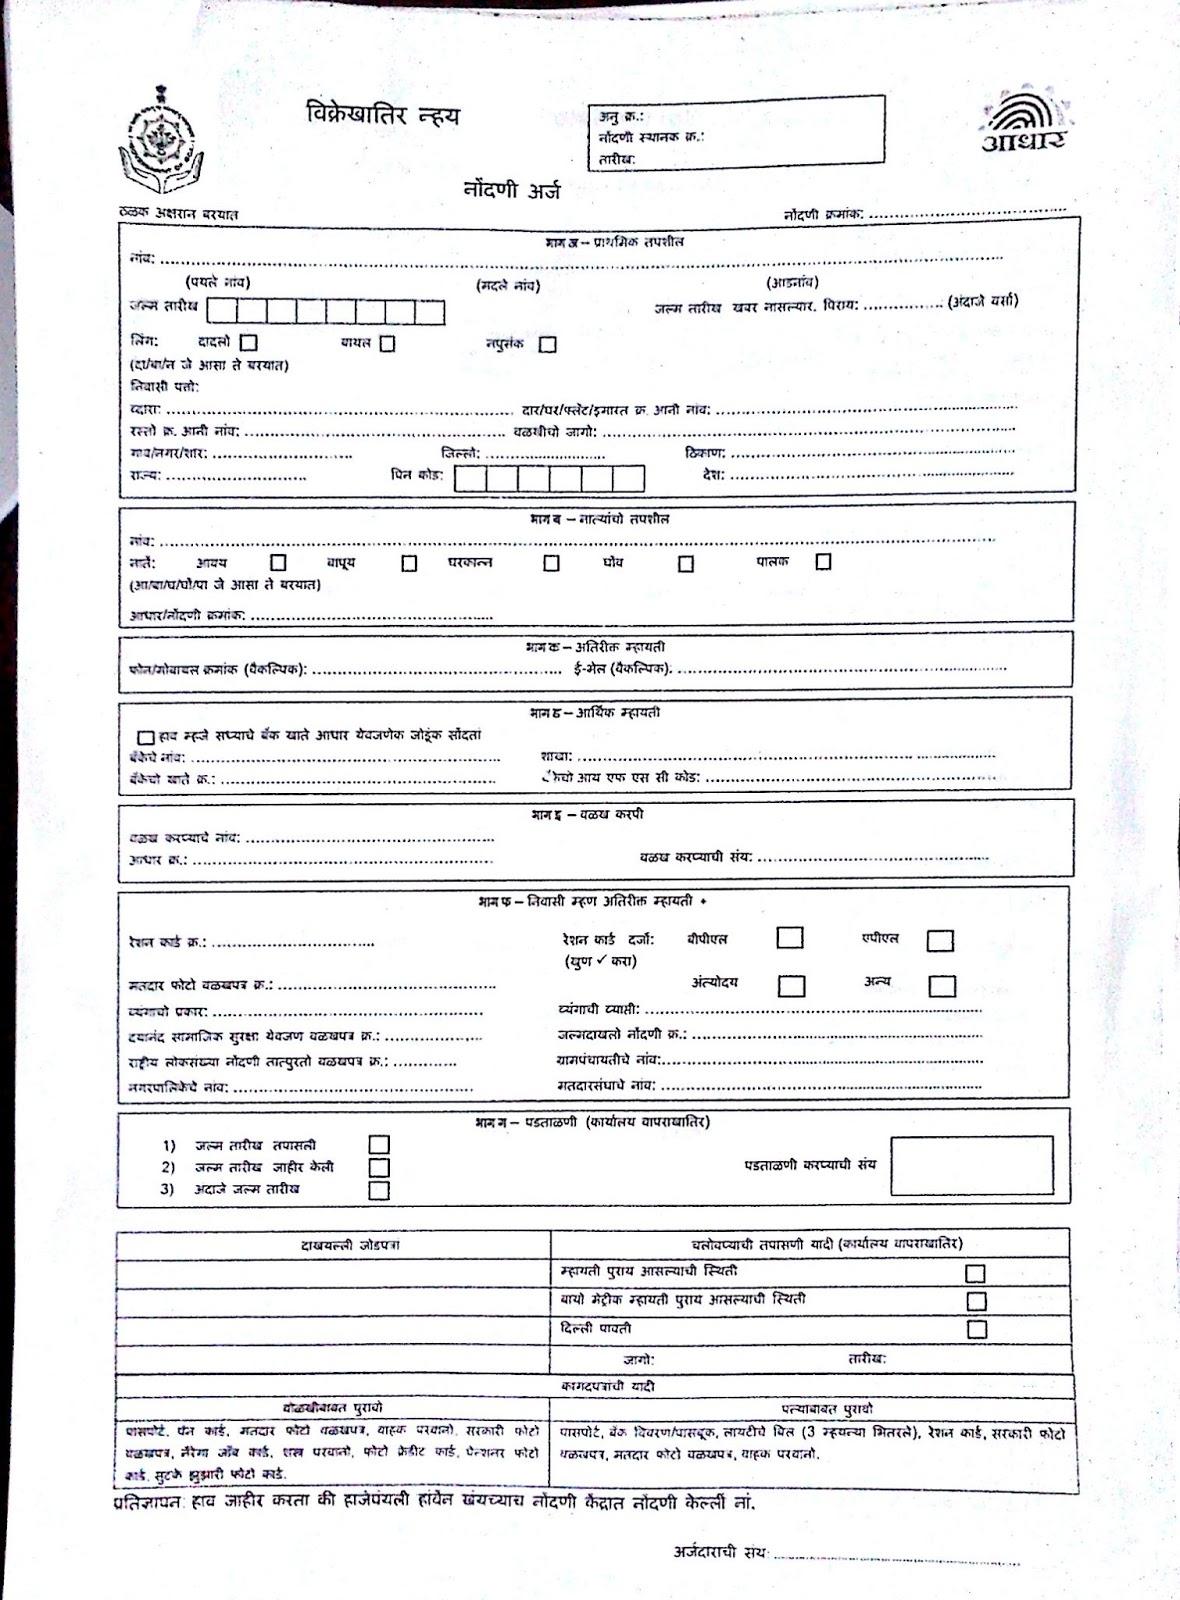 Adhar card form konmar. Mcpgroup. Co.